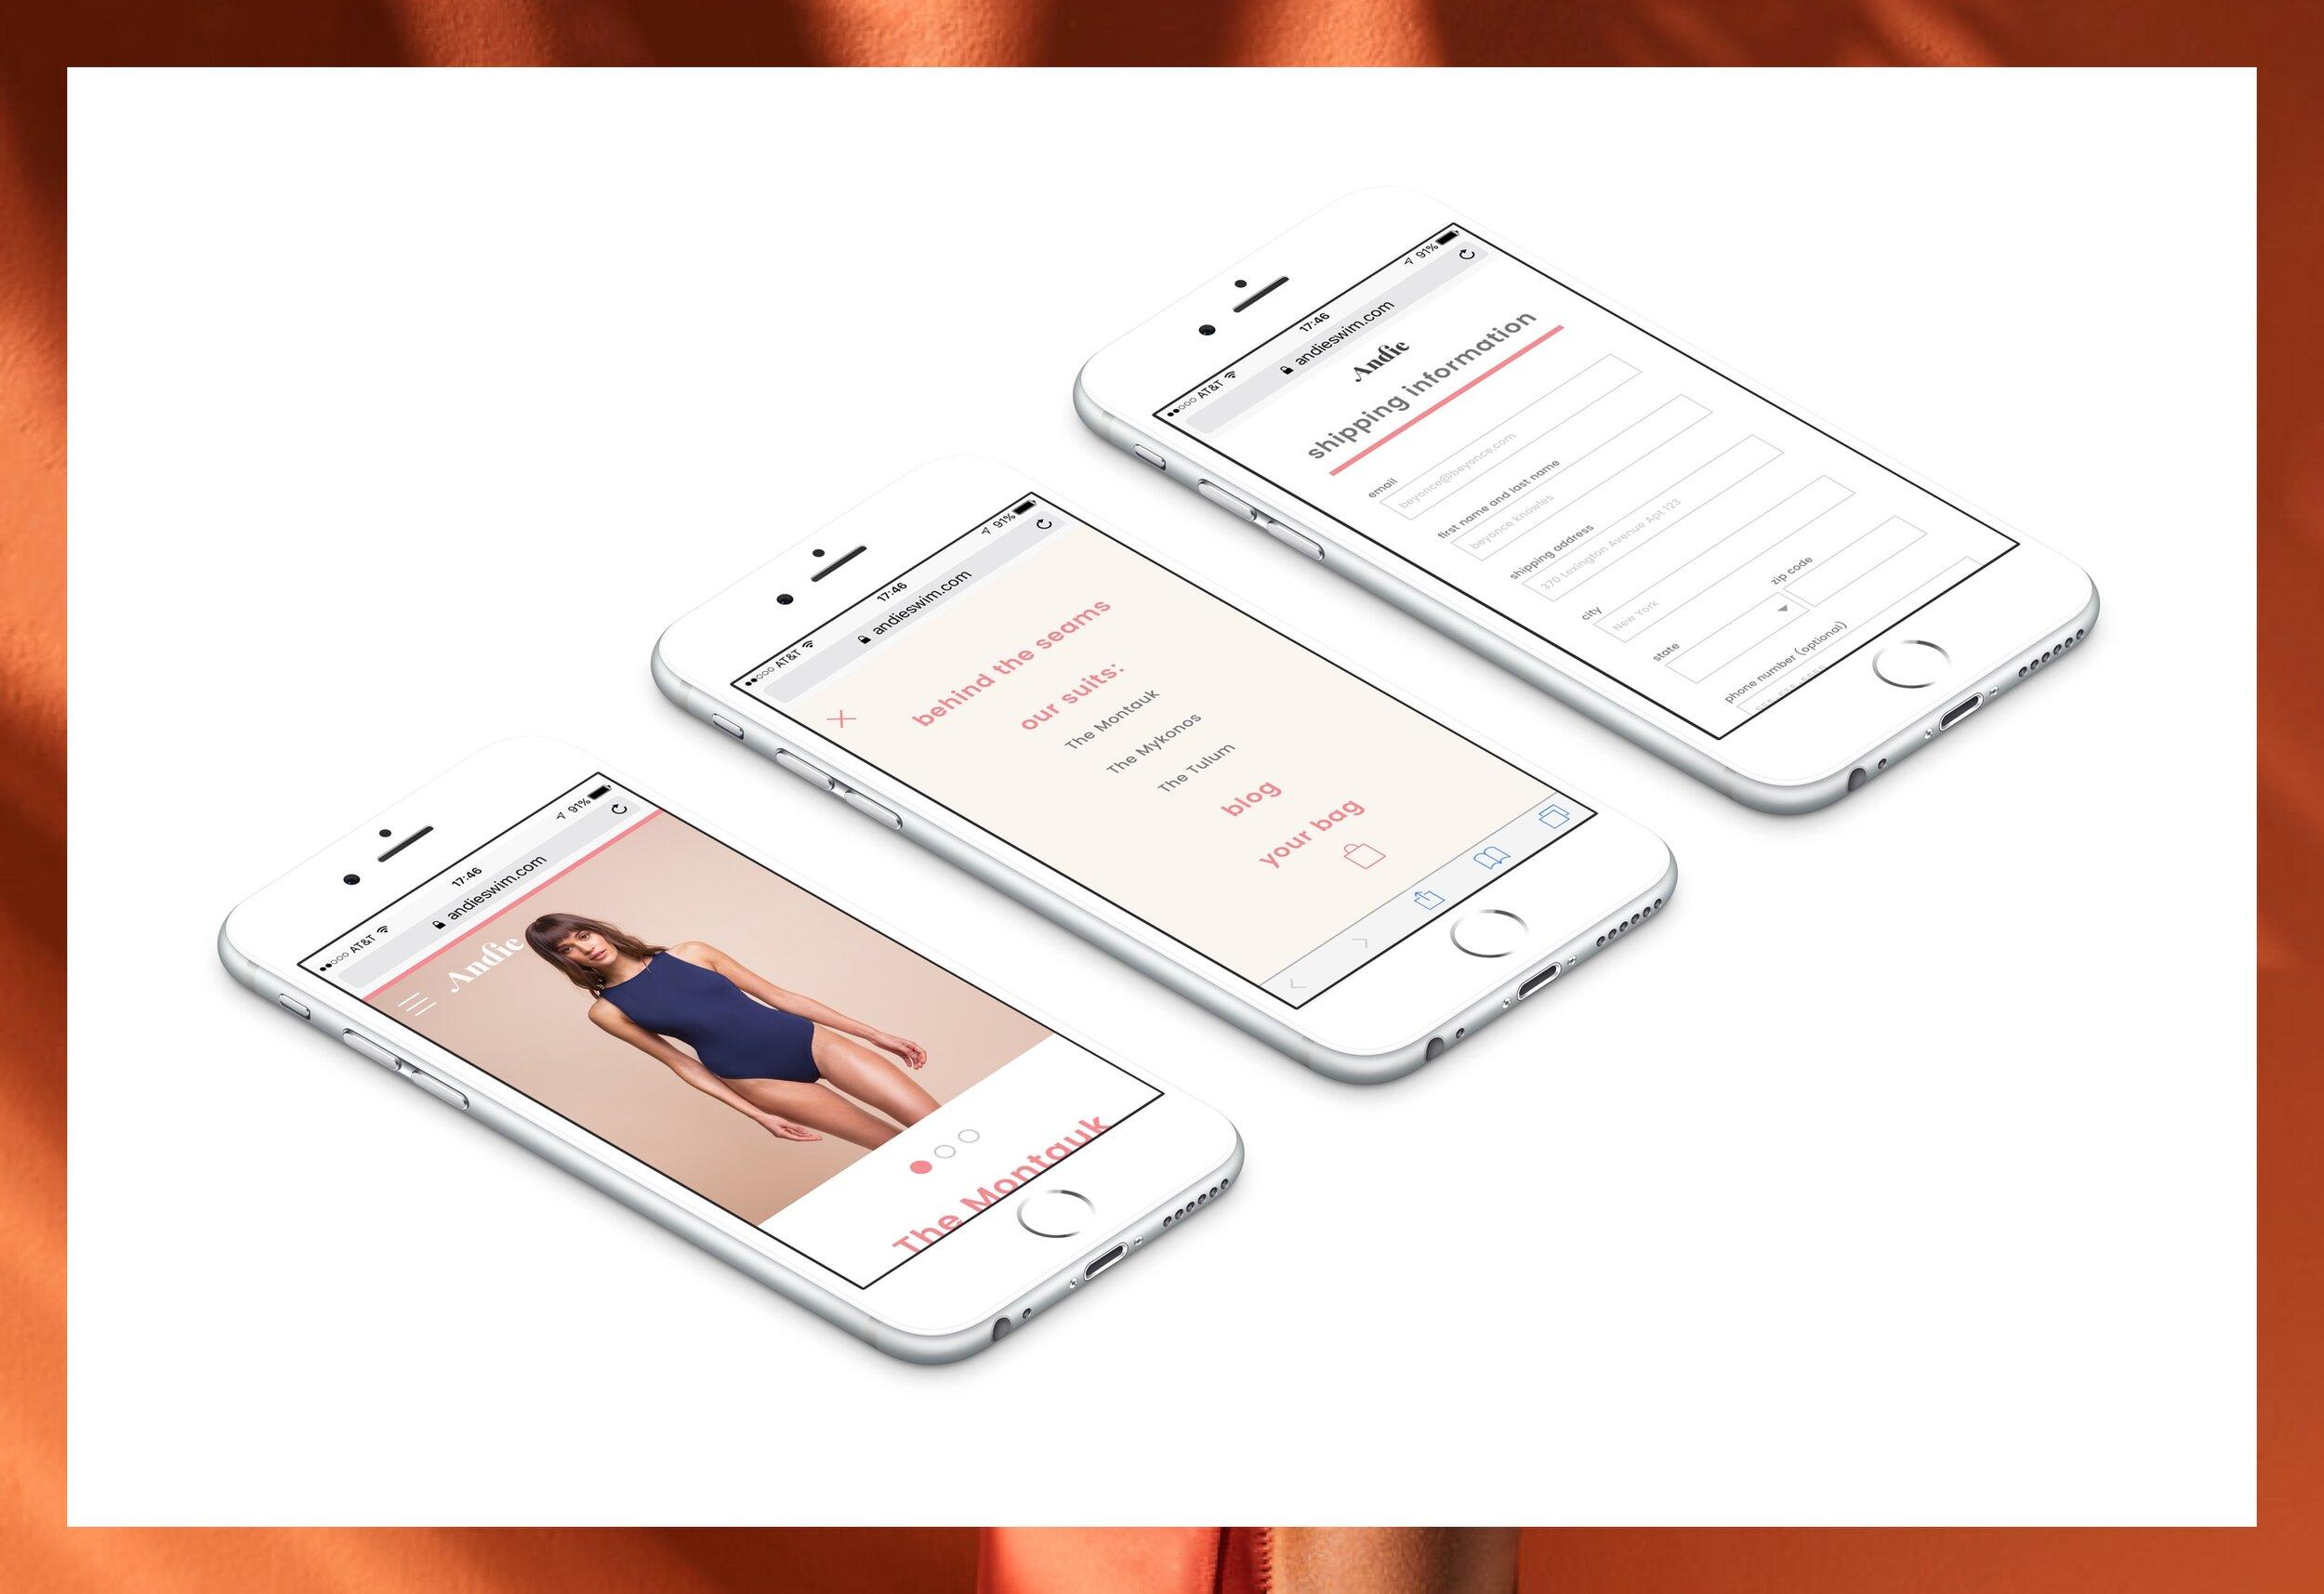 andie-swim-wildes-district-new-york-startup-branding-design-web-agency-7.jpg